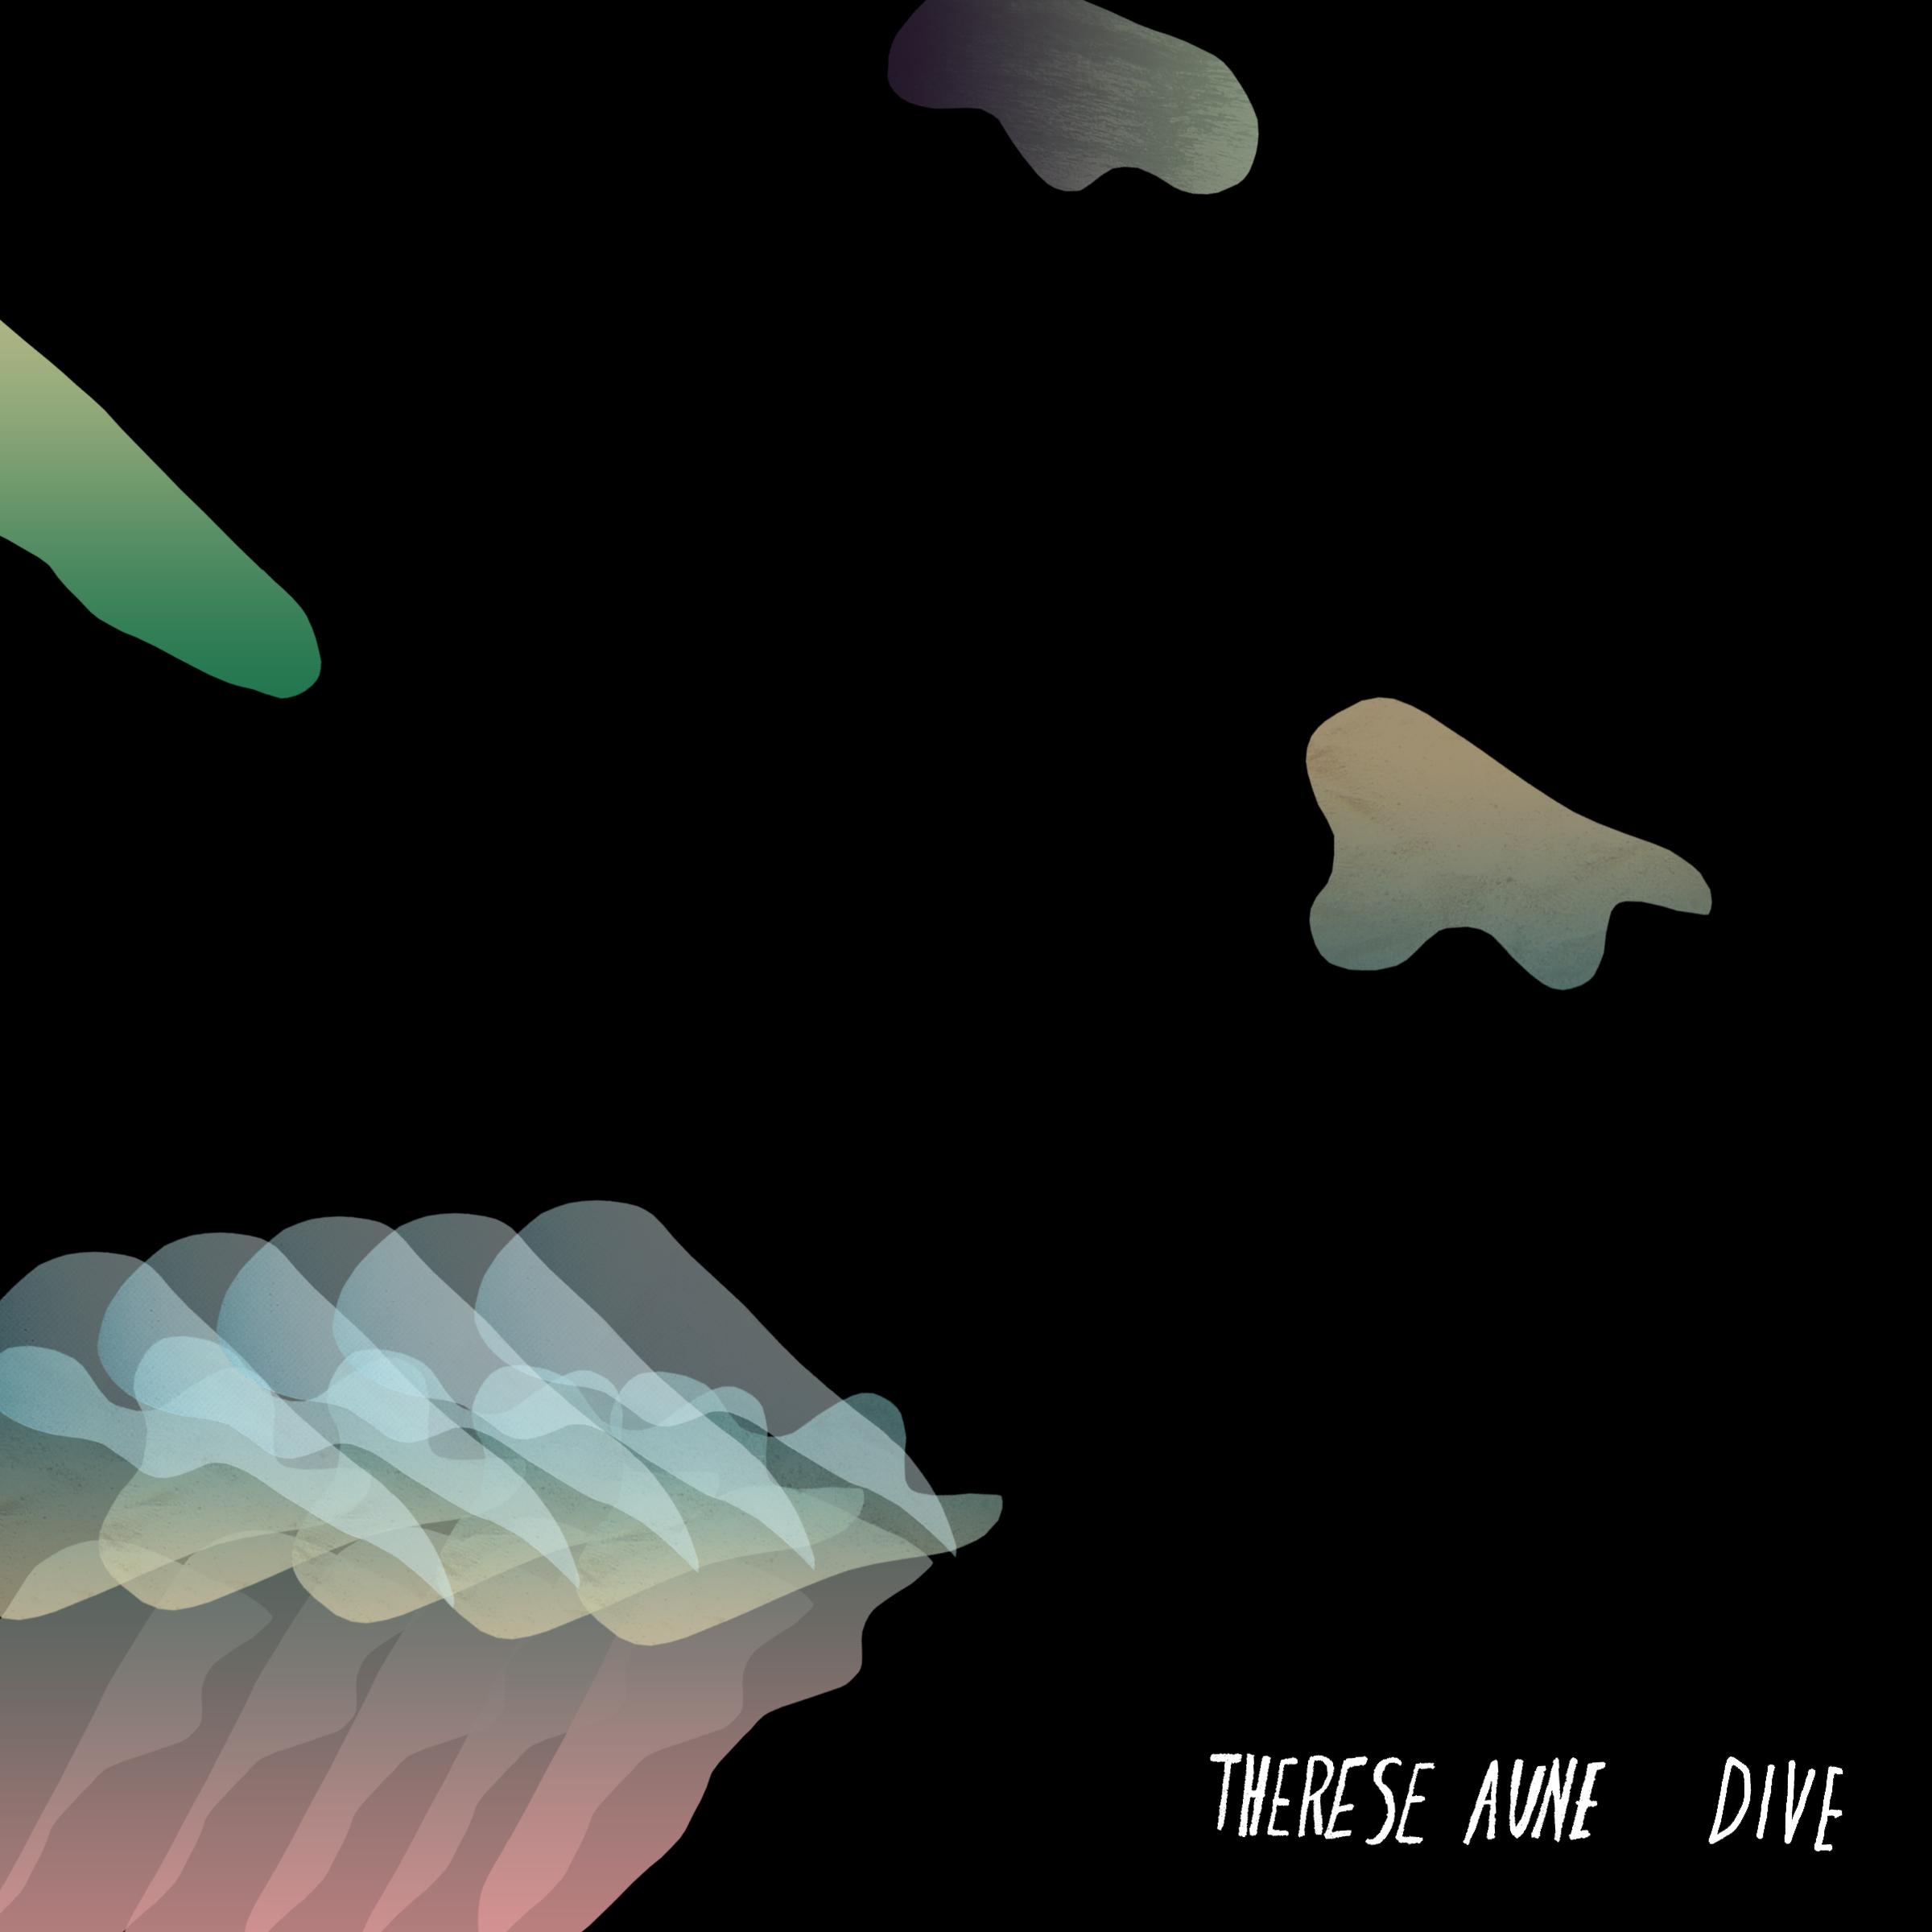 Copy of Dive (Single, Riot Factory, 2015)